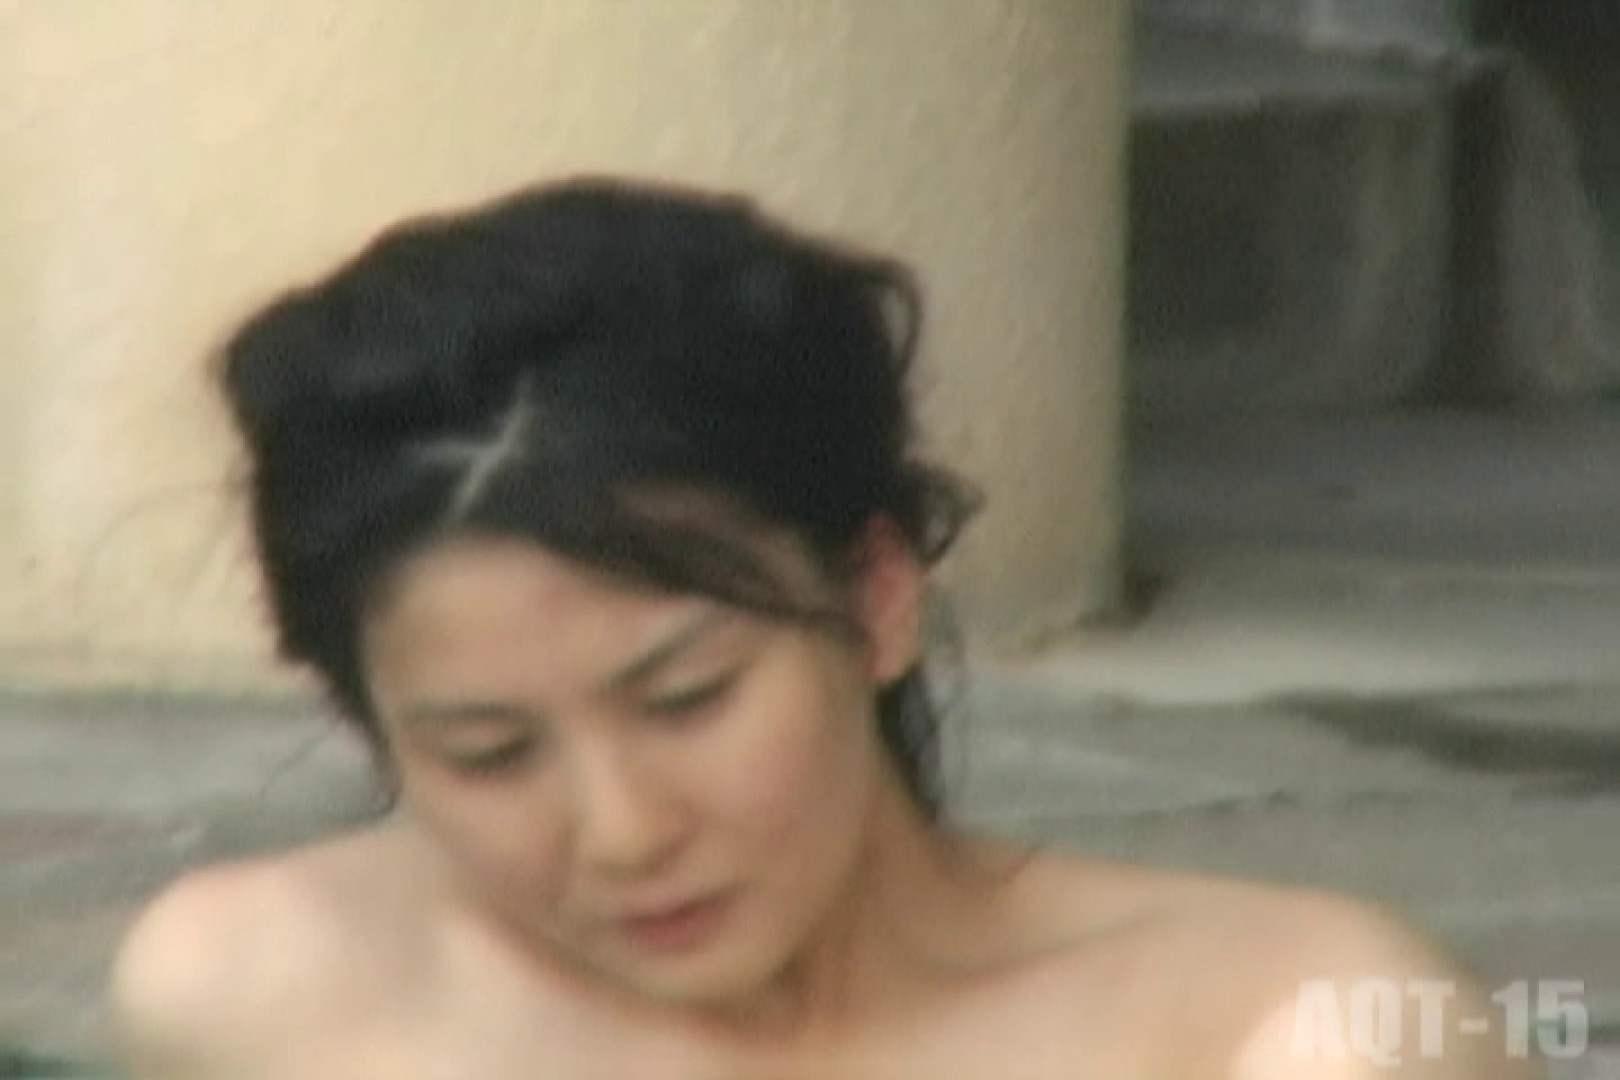 Aquaな露天風呂Vol.832 露天風呂編  108PIX 14